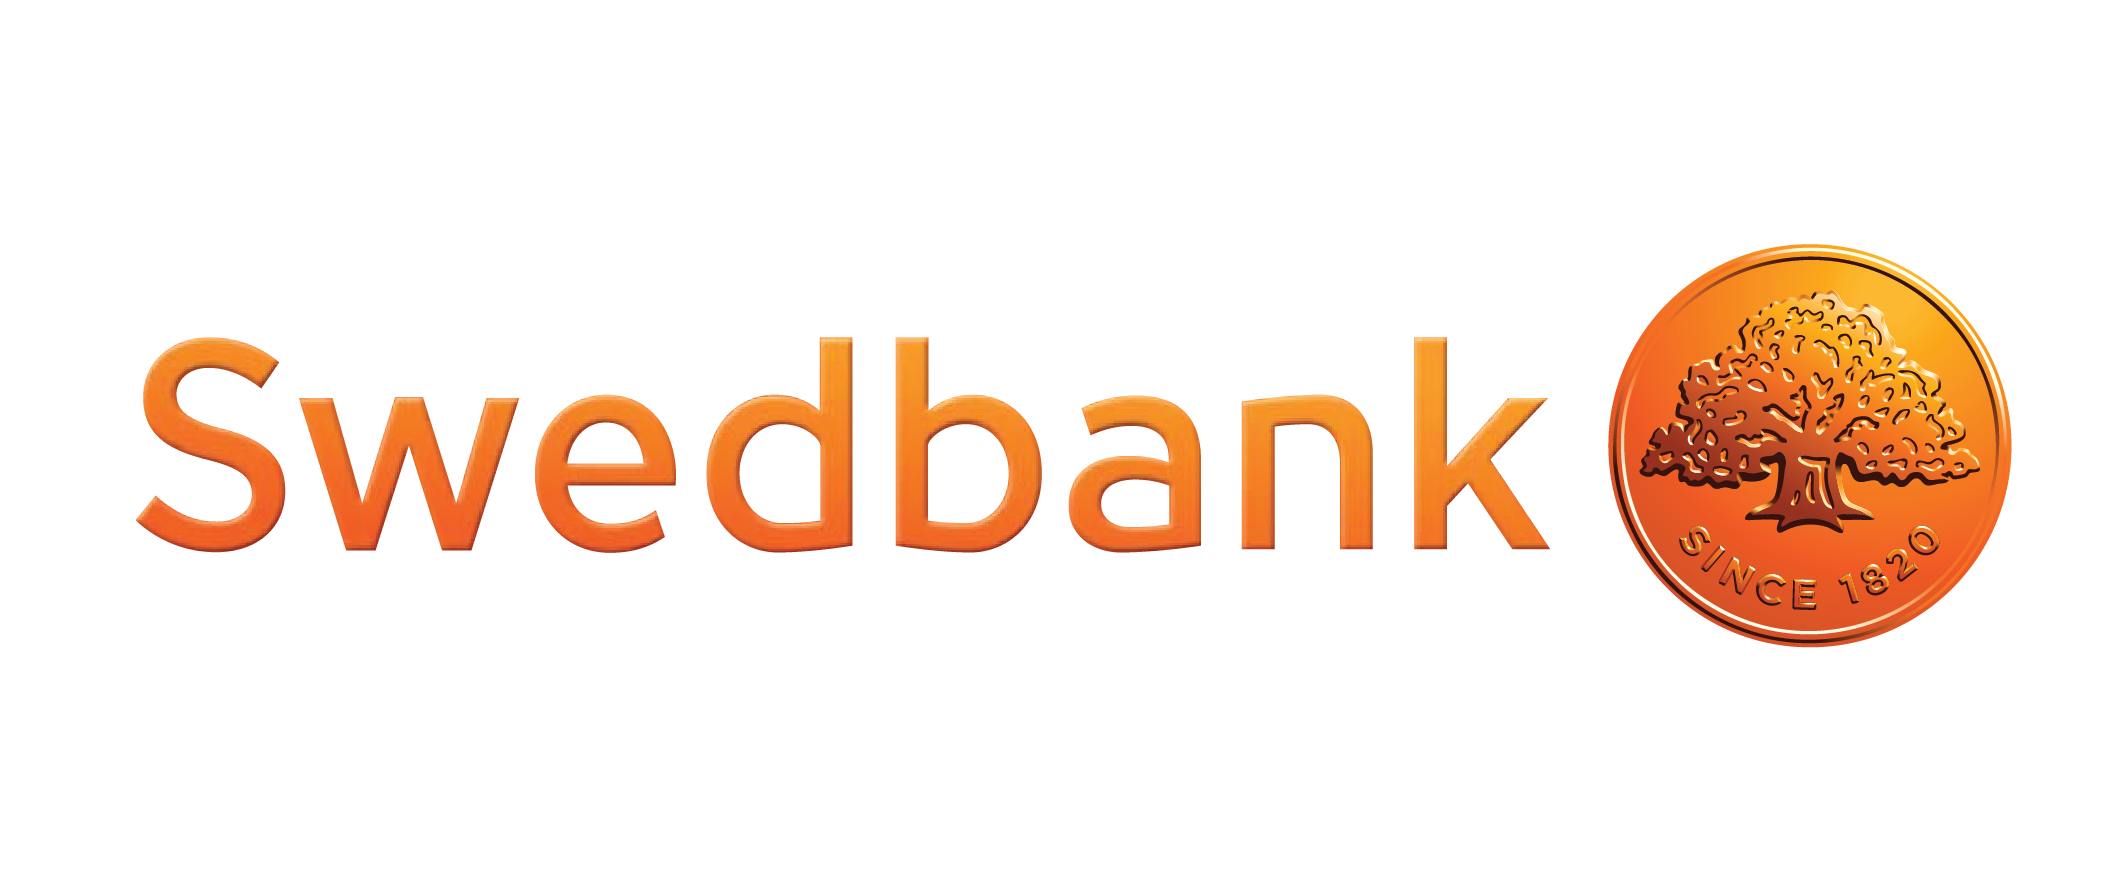 Swedbank-logo_Lithuania-success-stories_Swedbank